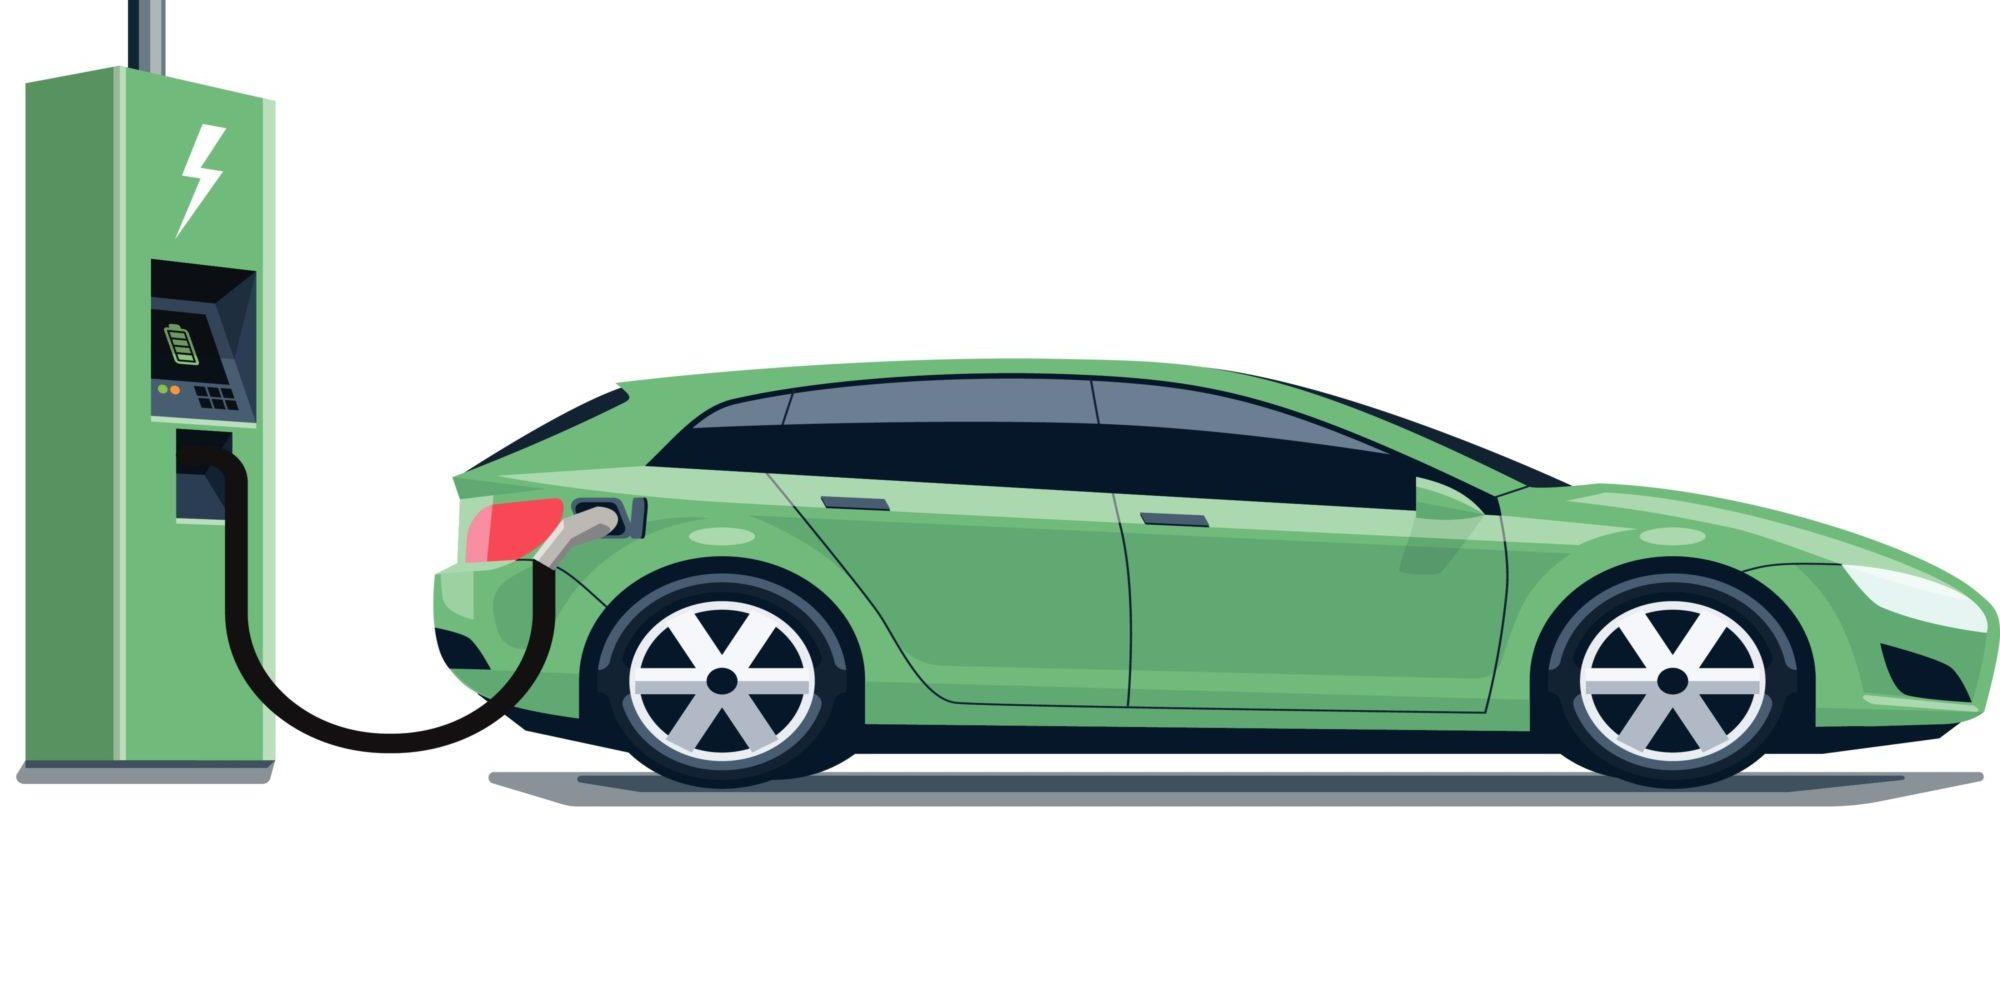 Grünes Elektroauto tankt Strom